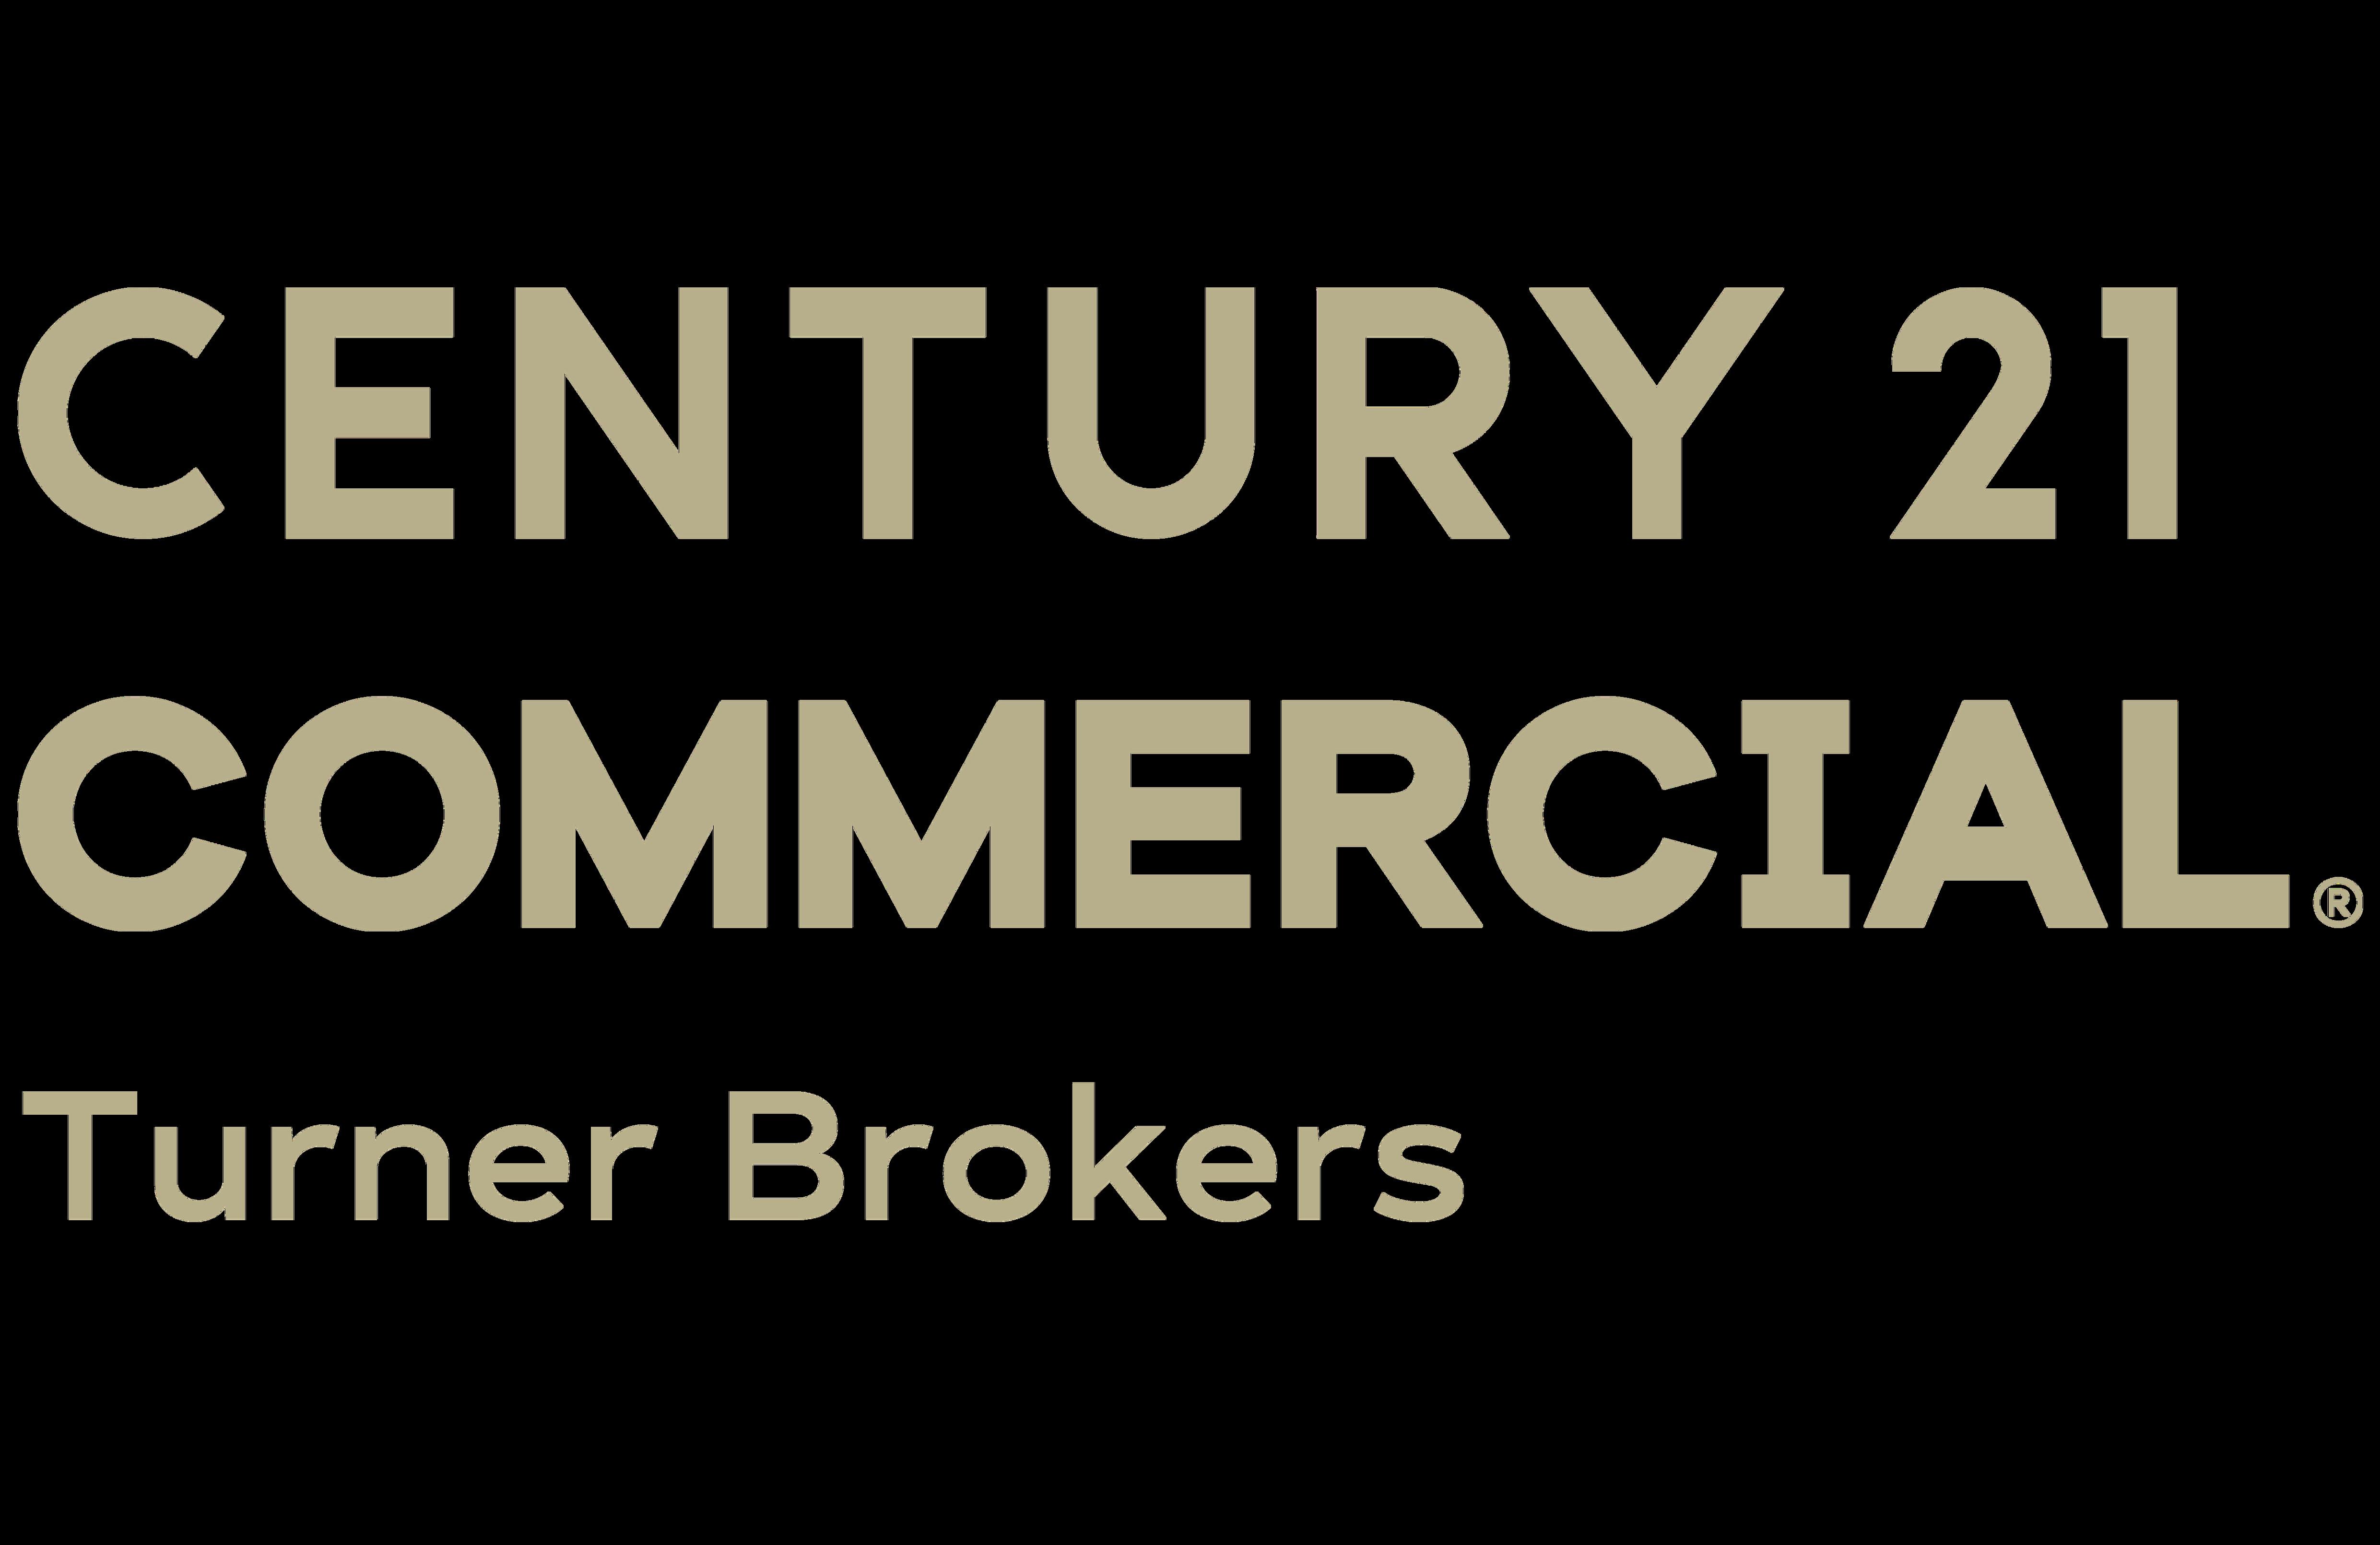 Andrea Eckman of CENTURY 21 Turner Brokers logo